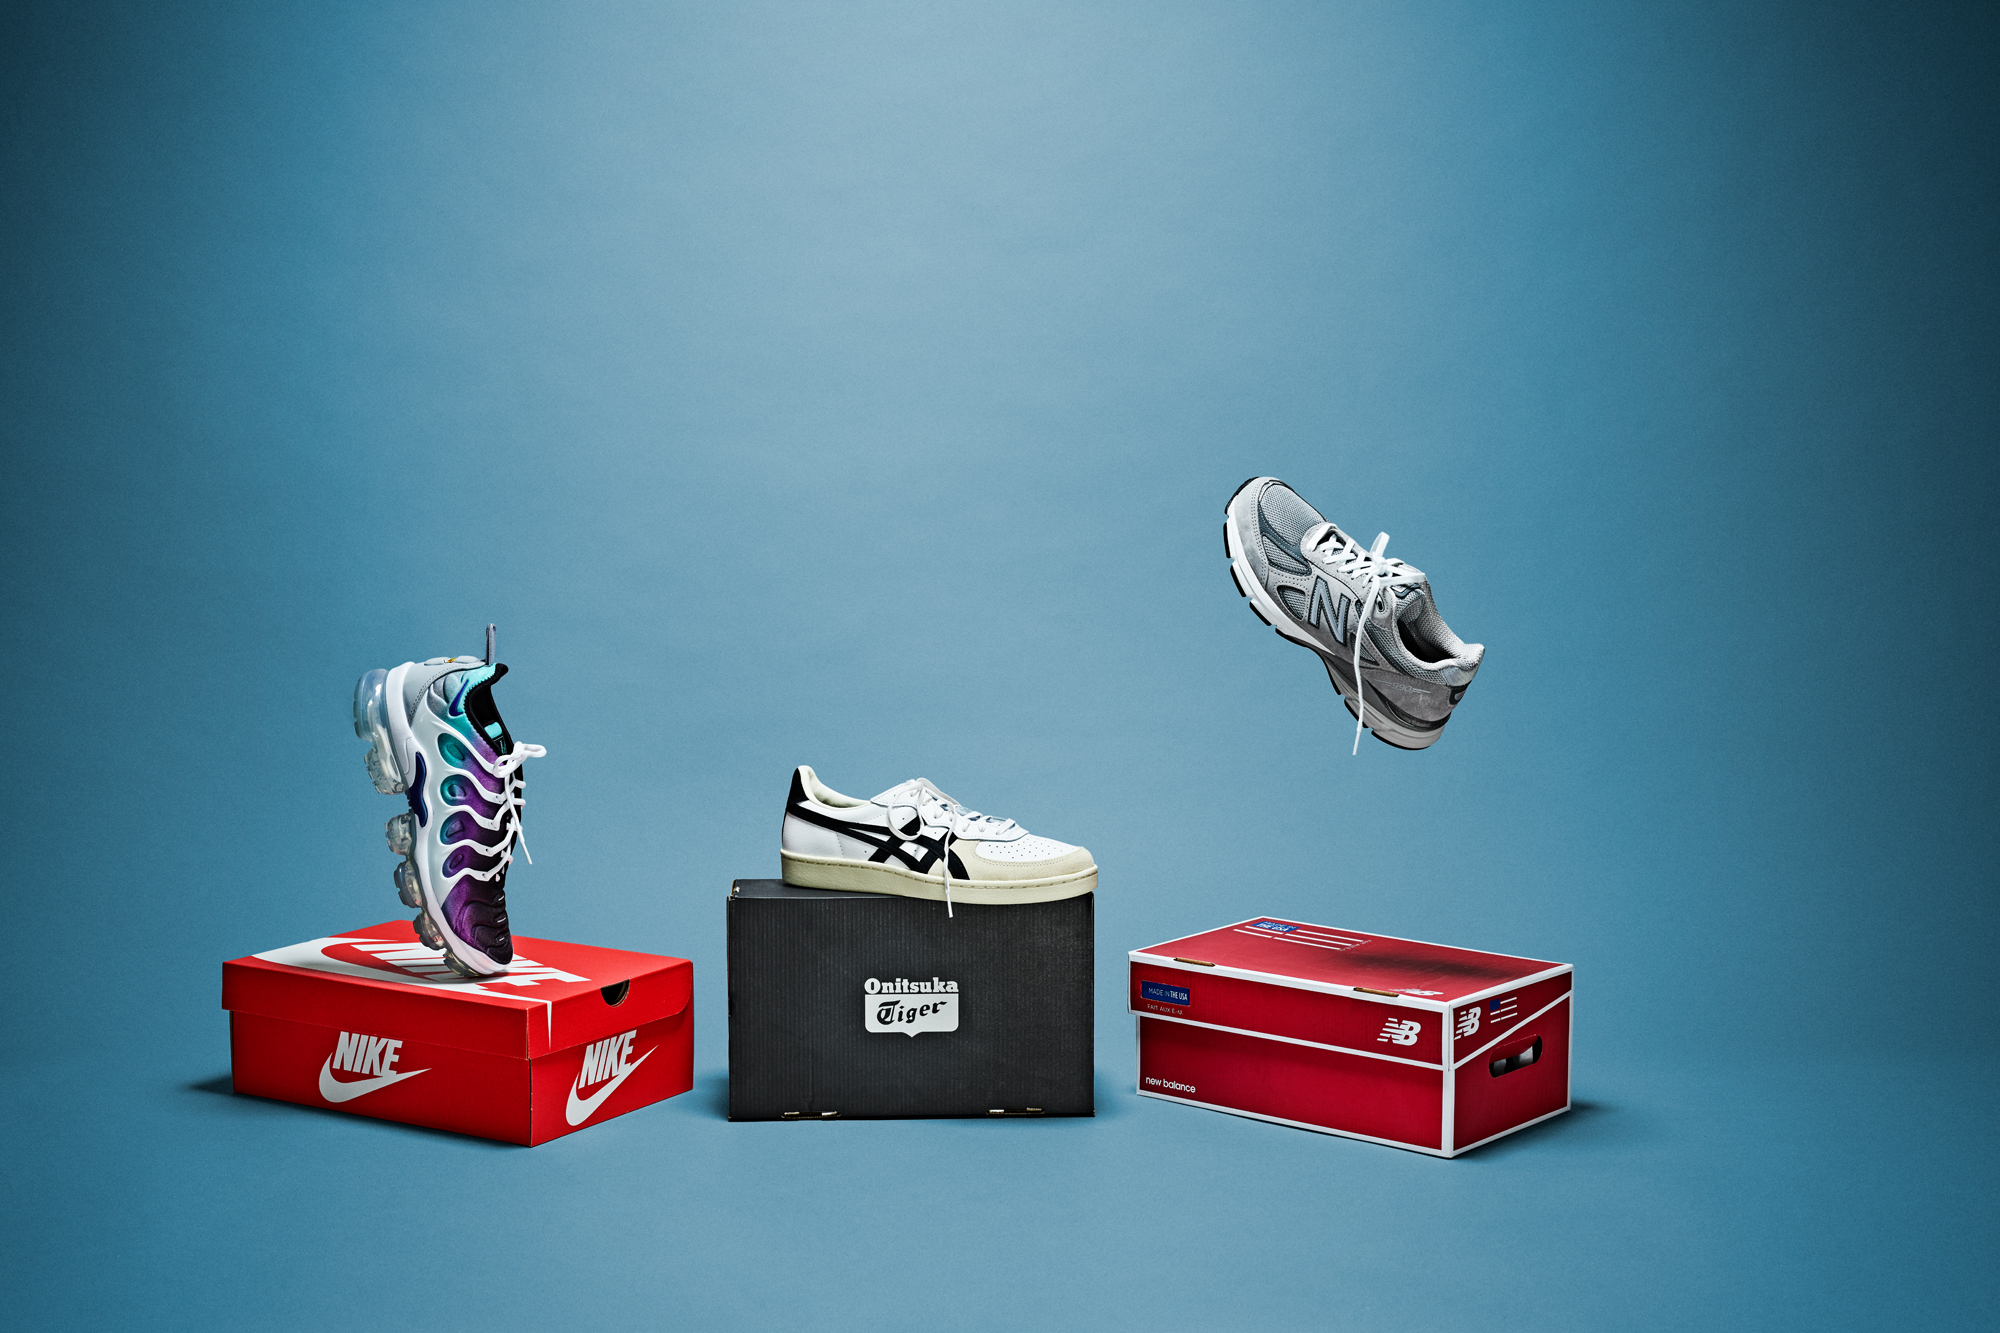 Nike-Air-Vapormax-Plus-Onitsuka-Tiger-GSM-New-Balance-M99OGI4-Oslo